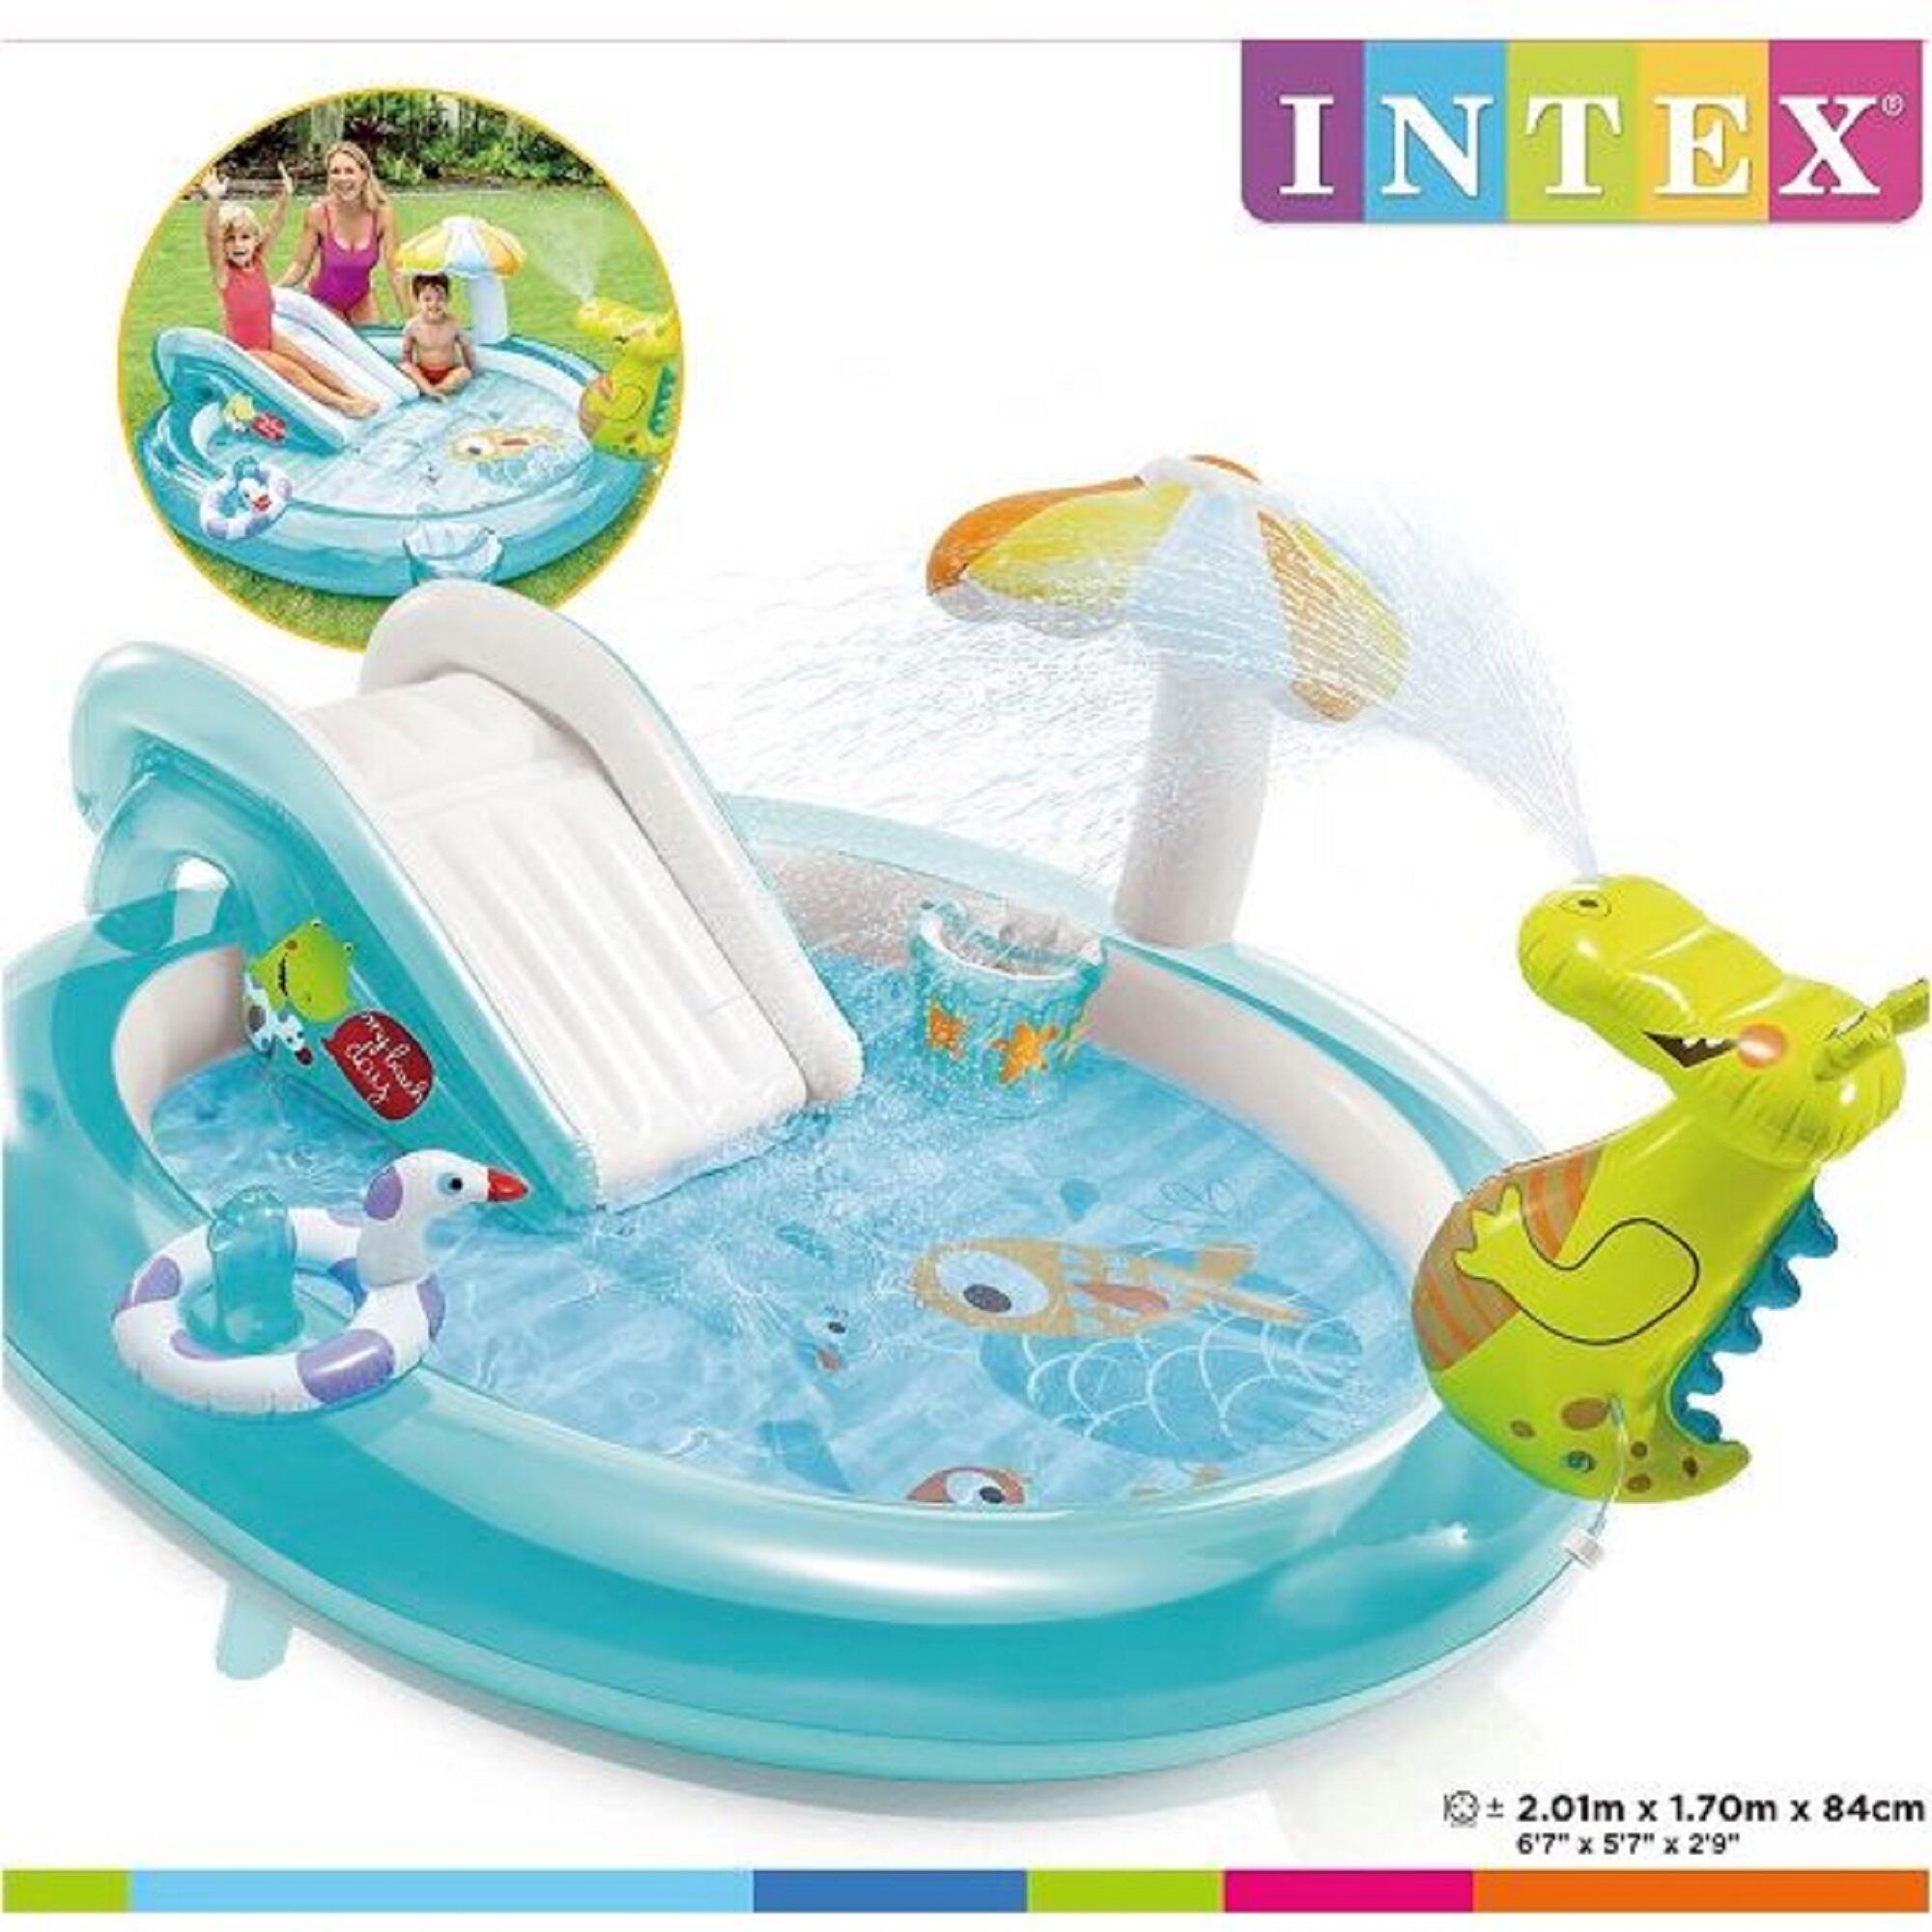 Intex Piscine Parc Aquatique Intex Avec Toboggan Pour Les Enfants De Plus De 3 Ans Decathlon